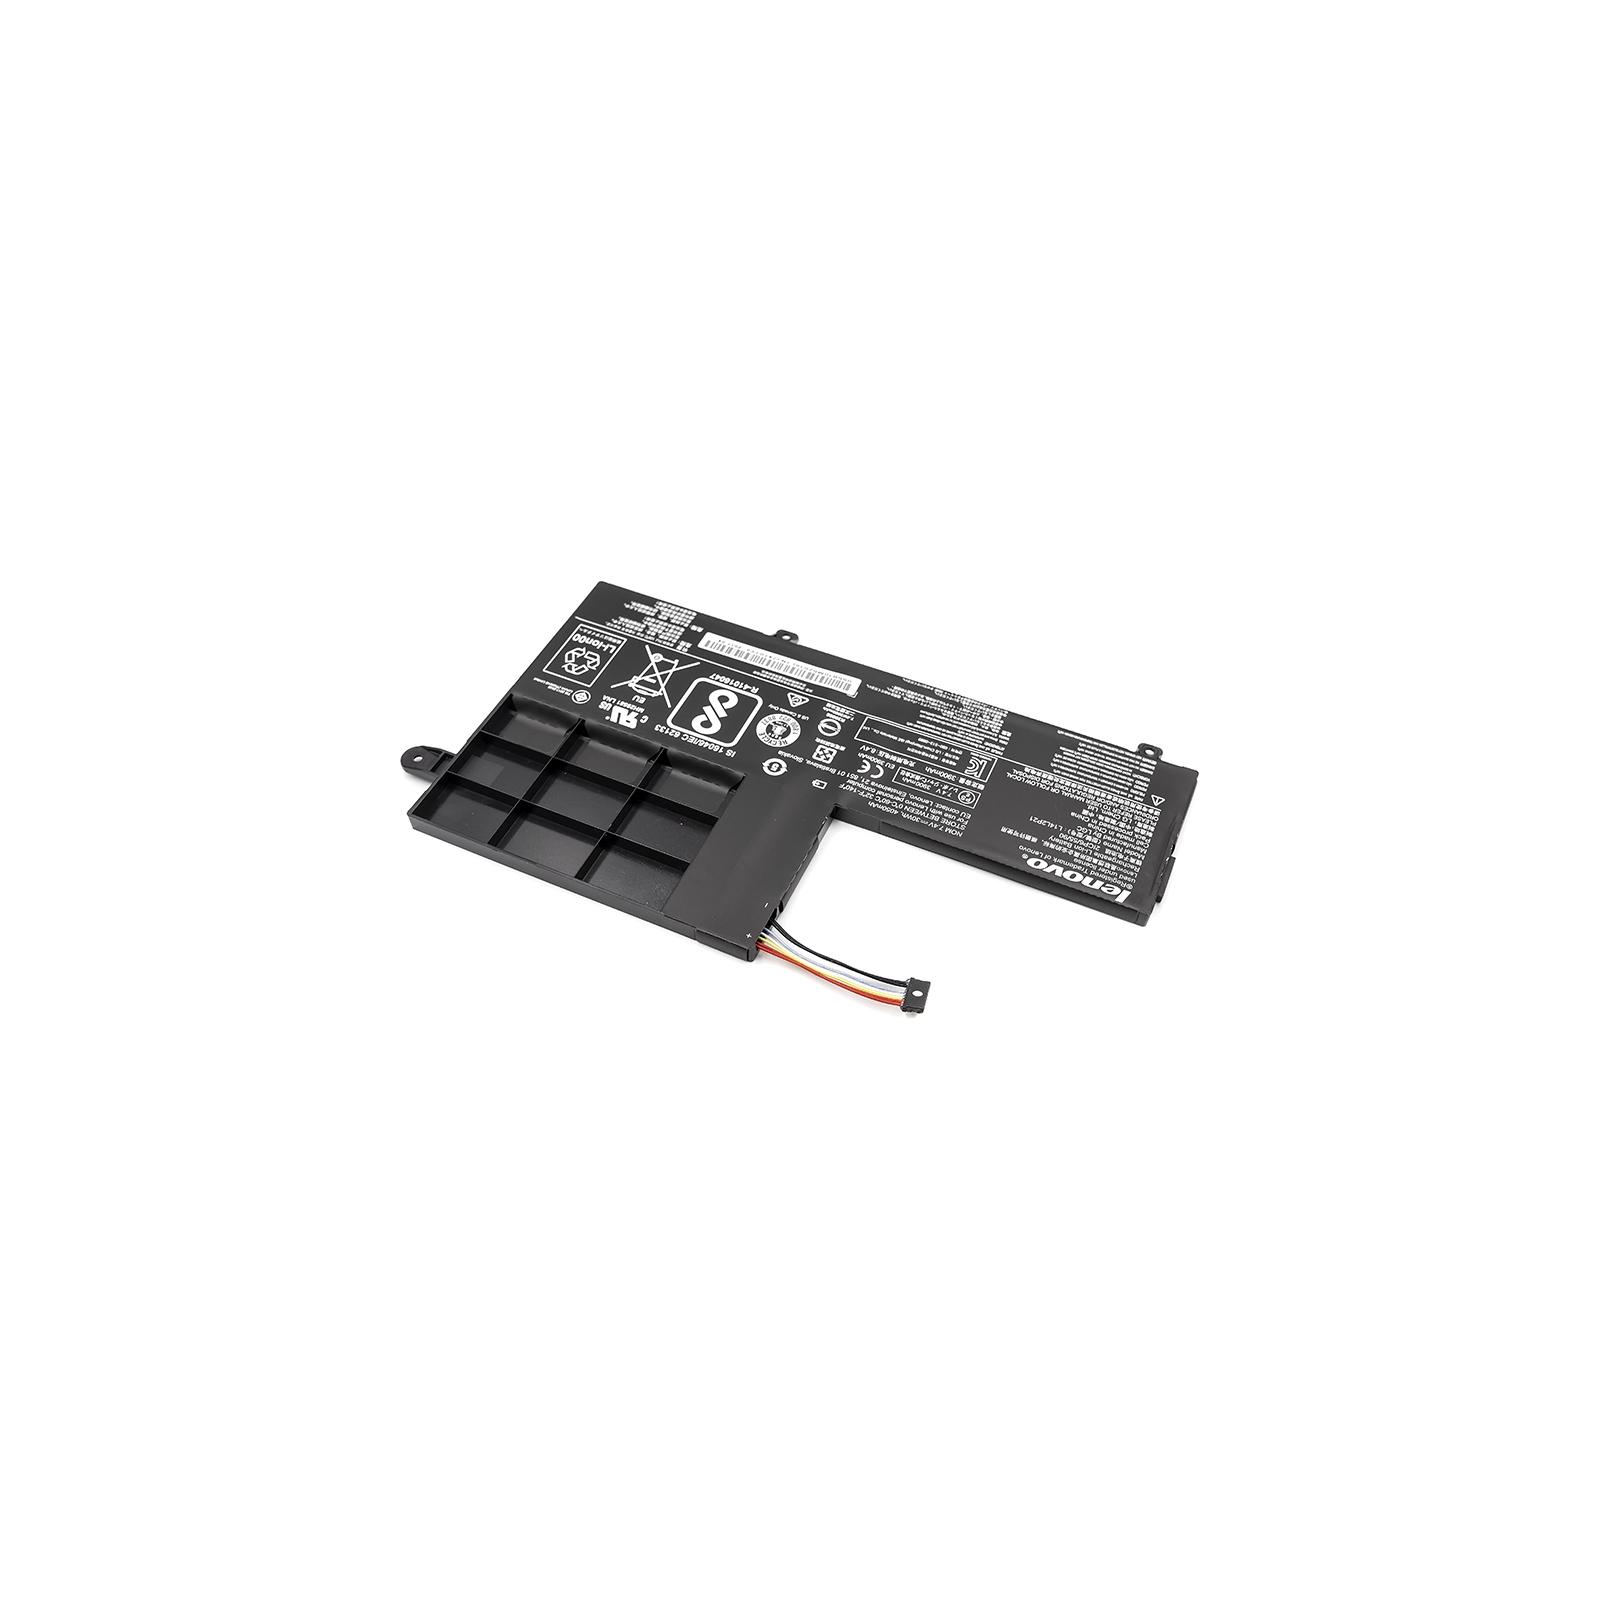 Аккумулятор для ноутбука Lenovo Ideapad 300S (L14M2P21) 7.4V 30Wh (NB480715) изображение 2